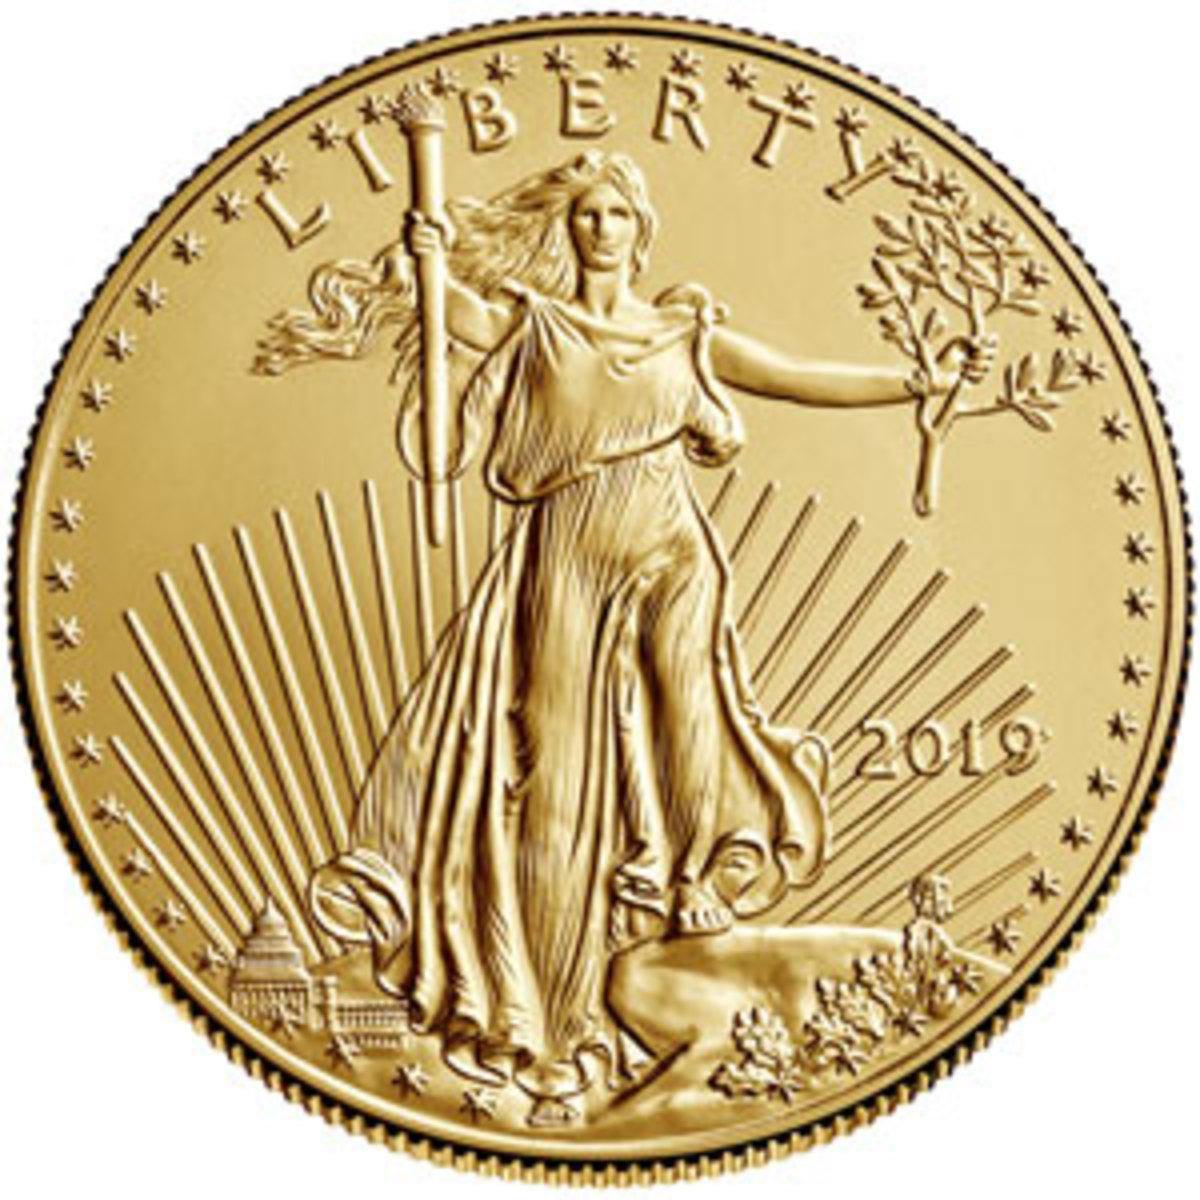 Gold bullion Eagle coin